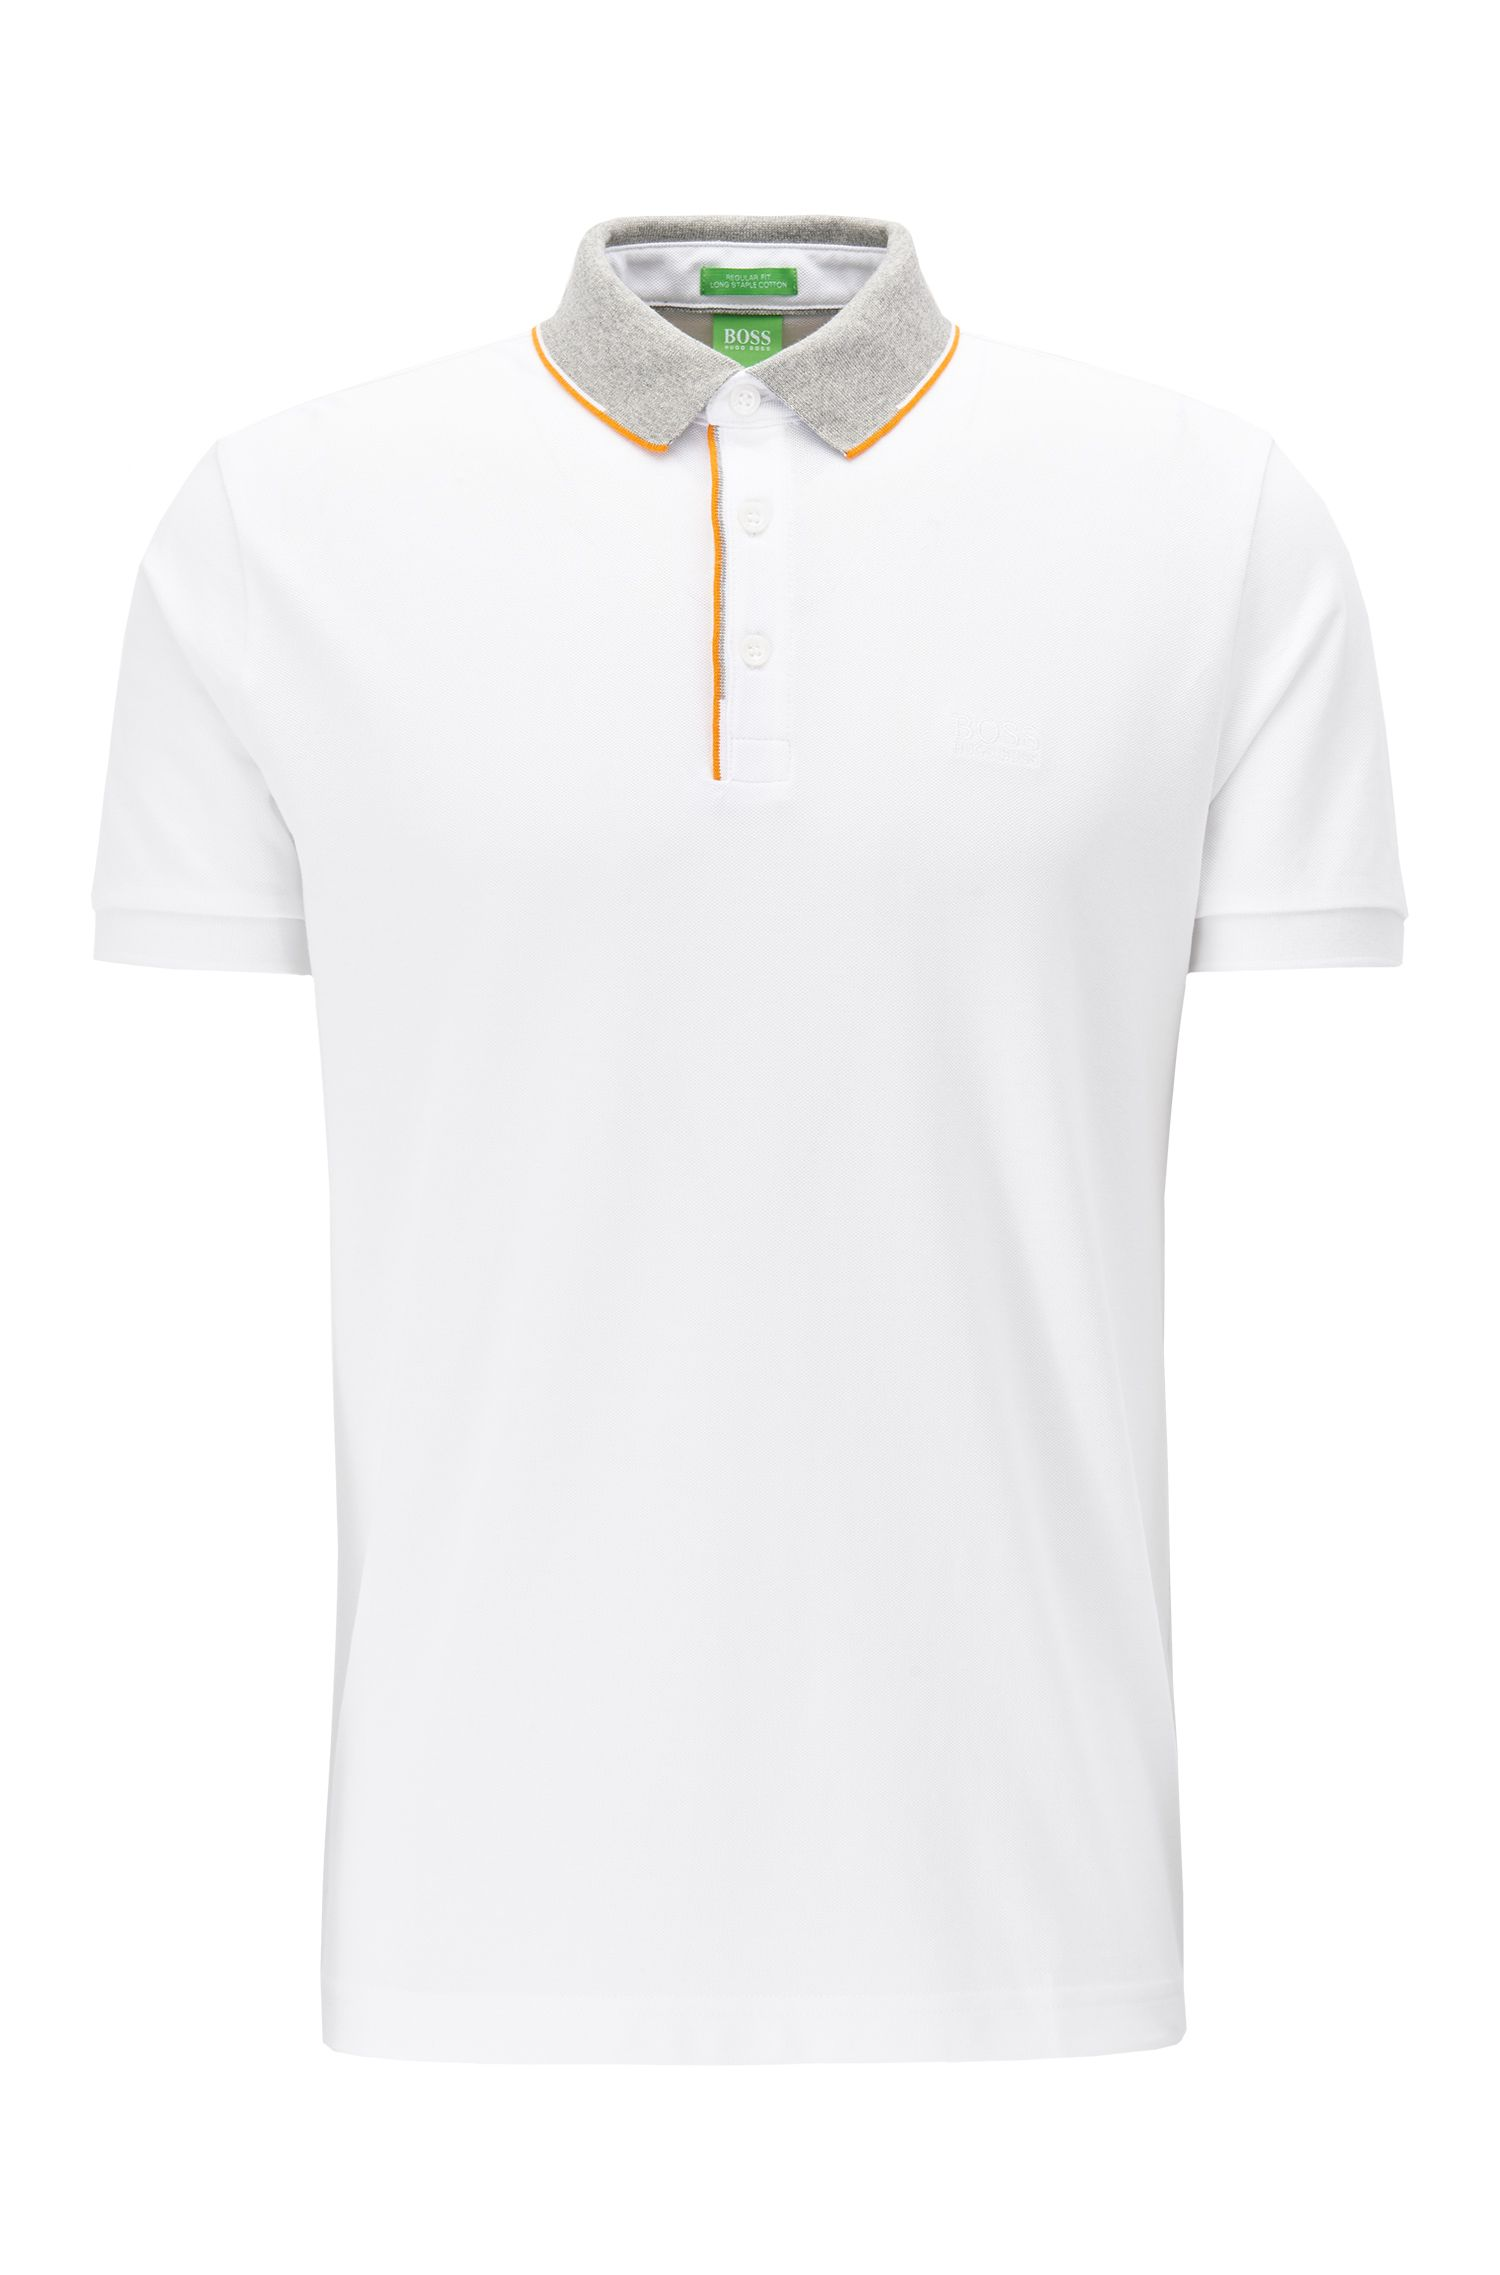 Regular fit cotton piqué polo shirt with contrast collar